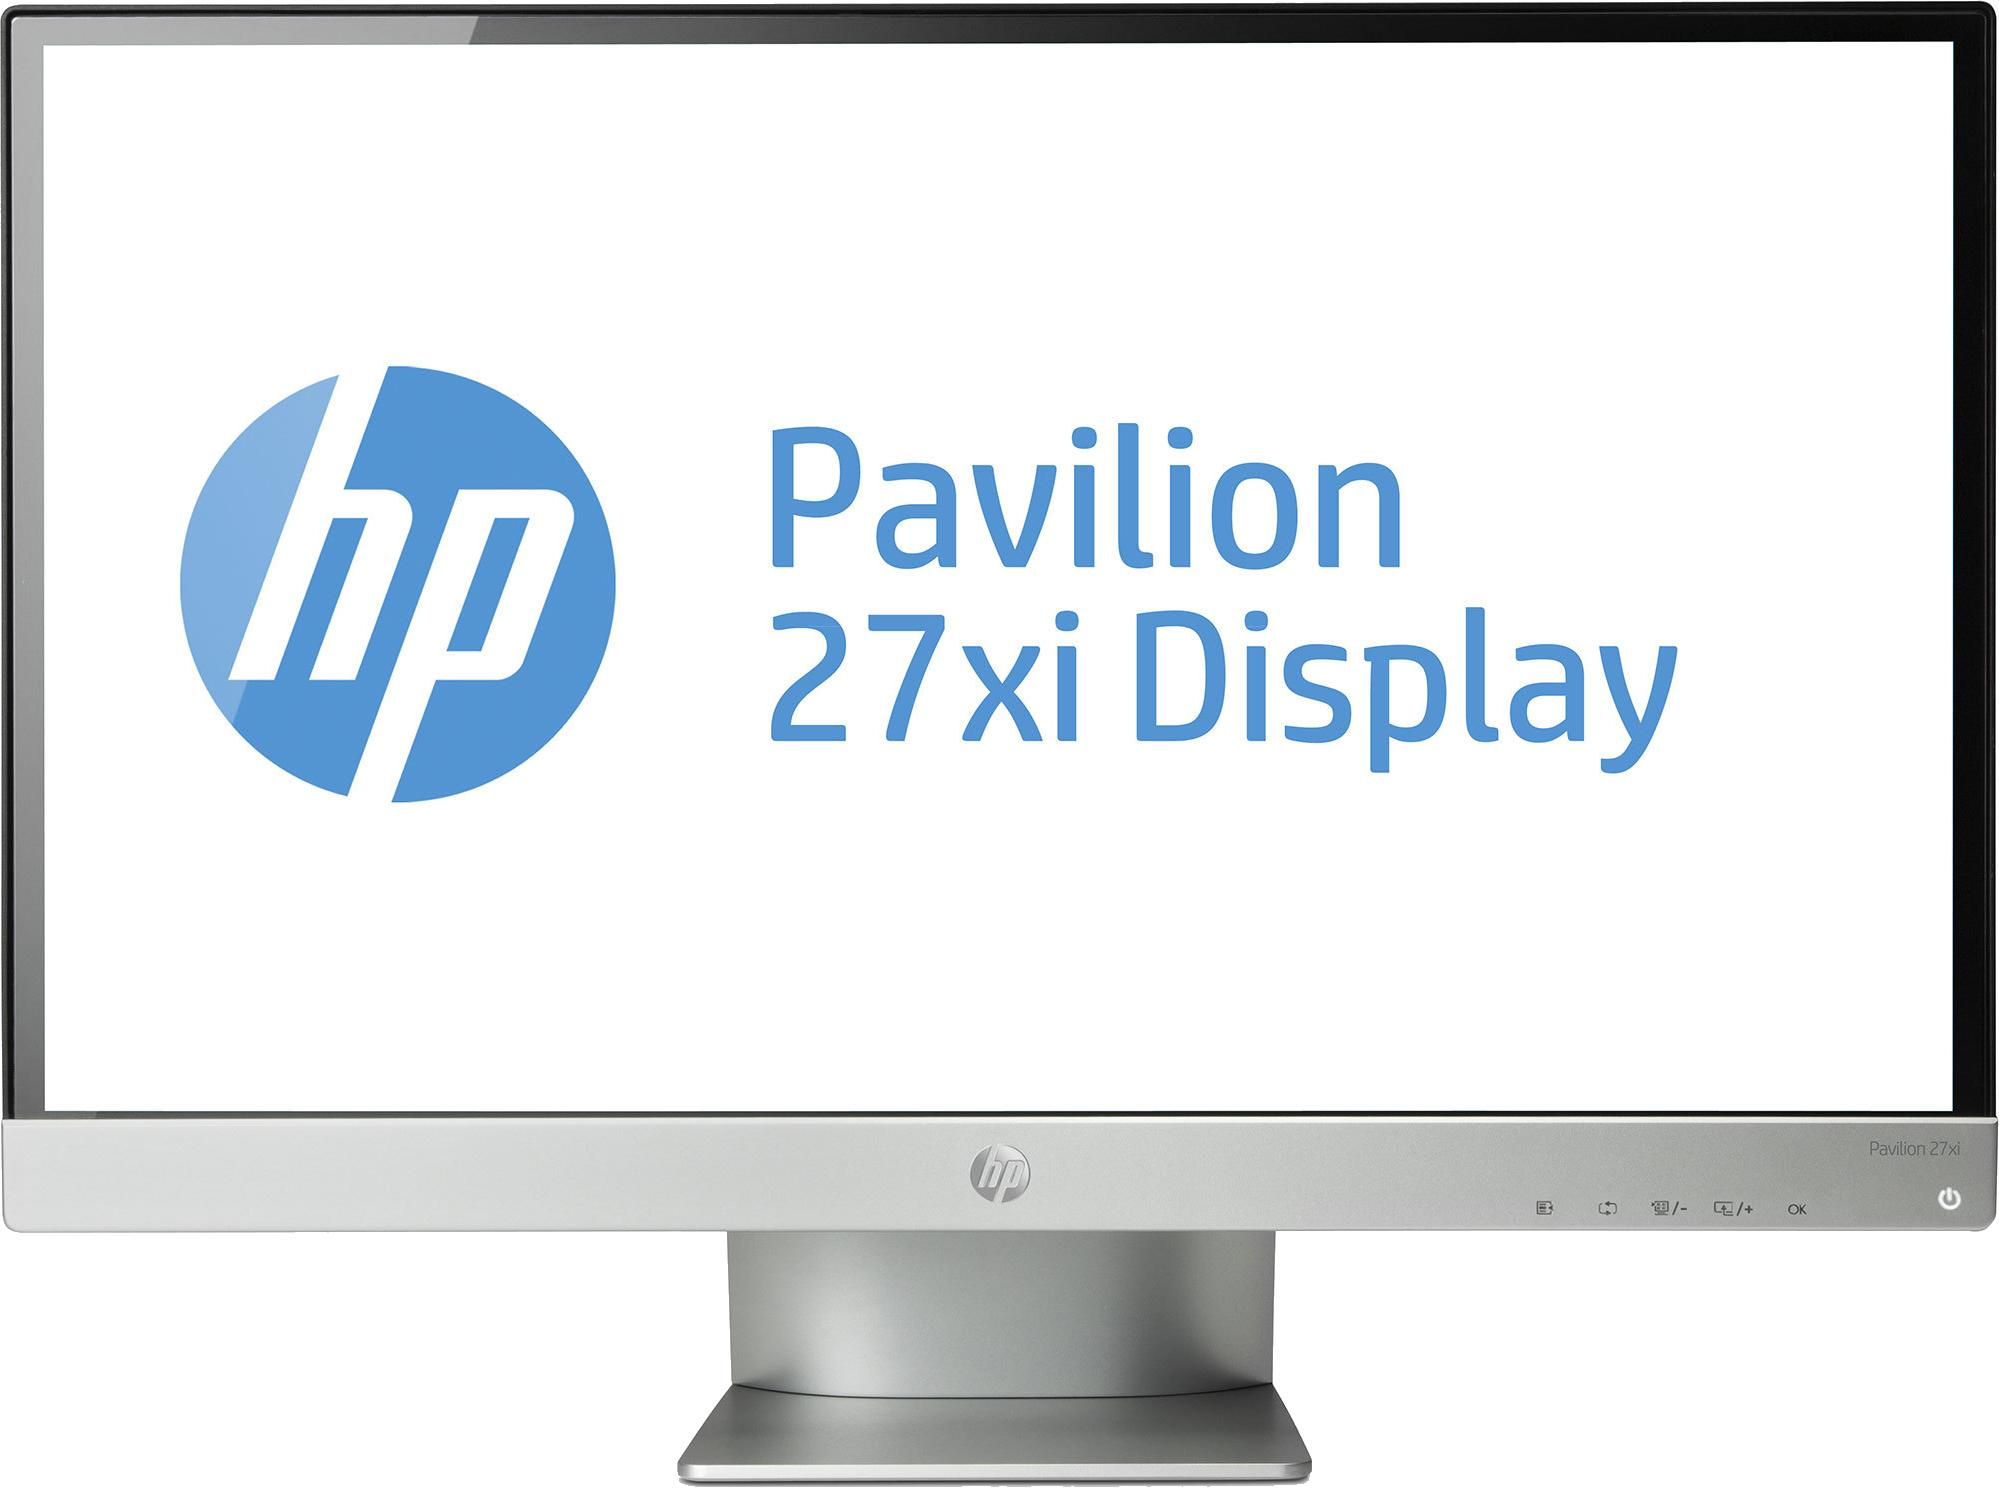 HP Pavilion 27xi